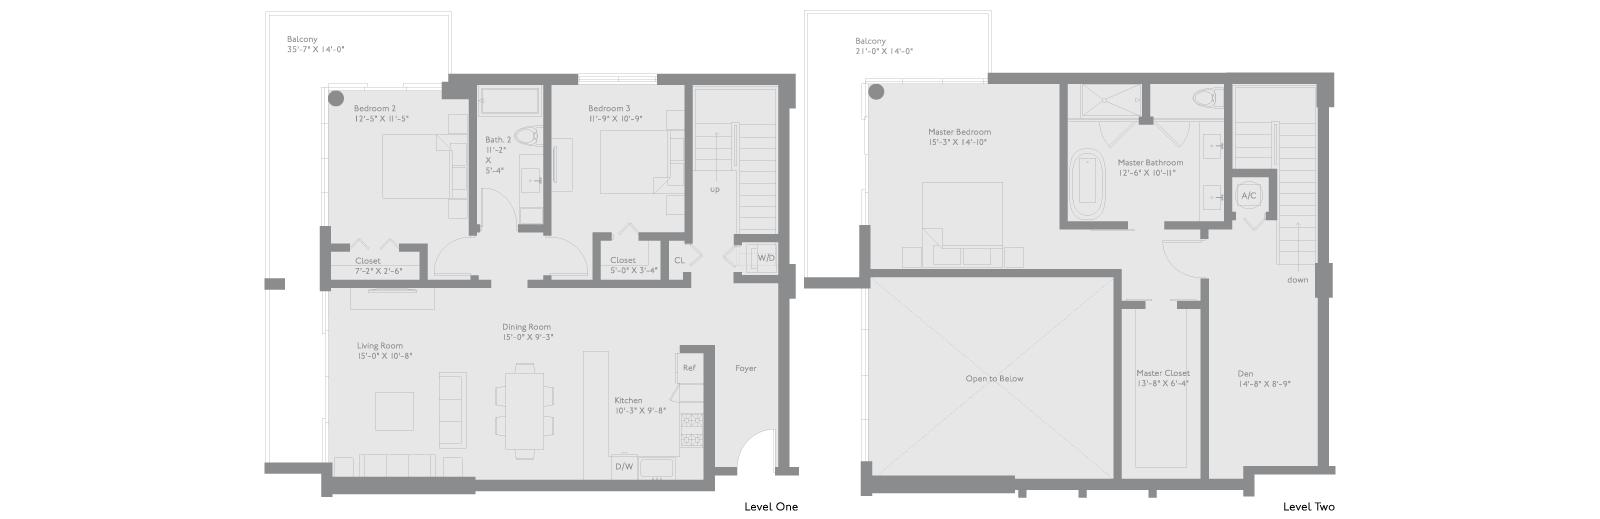 Arbor Floor Plan C 12 15 17